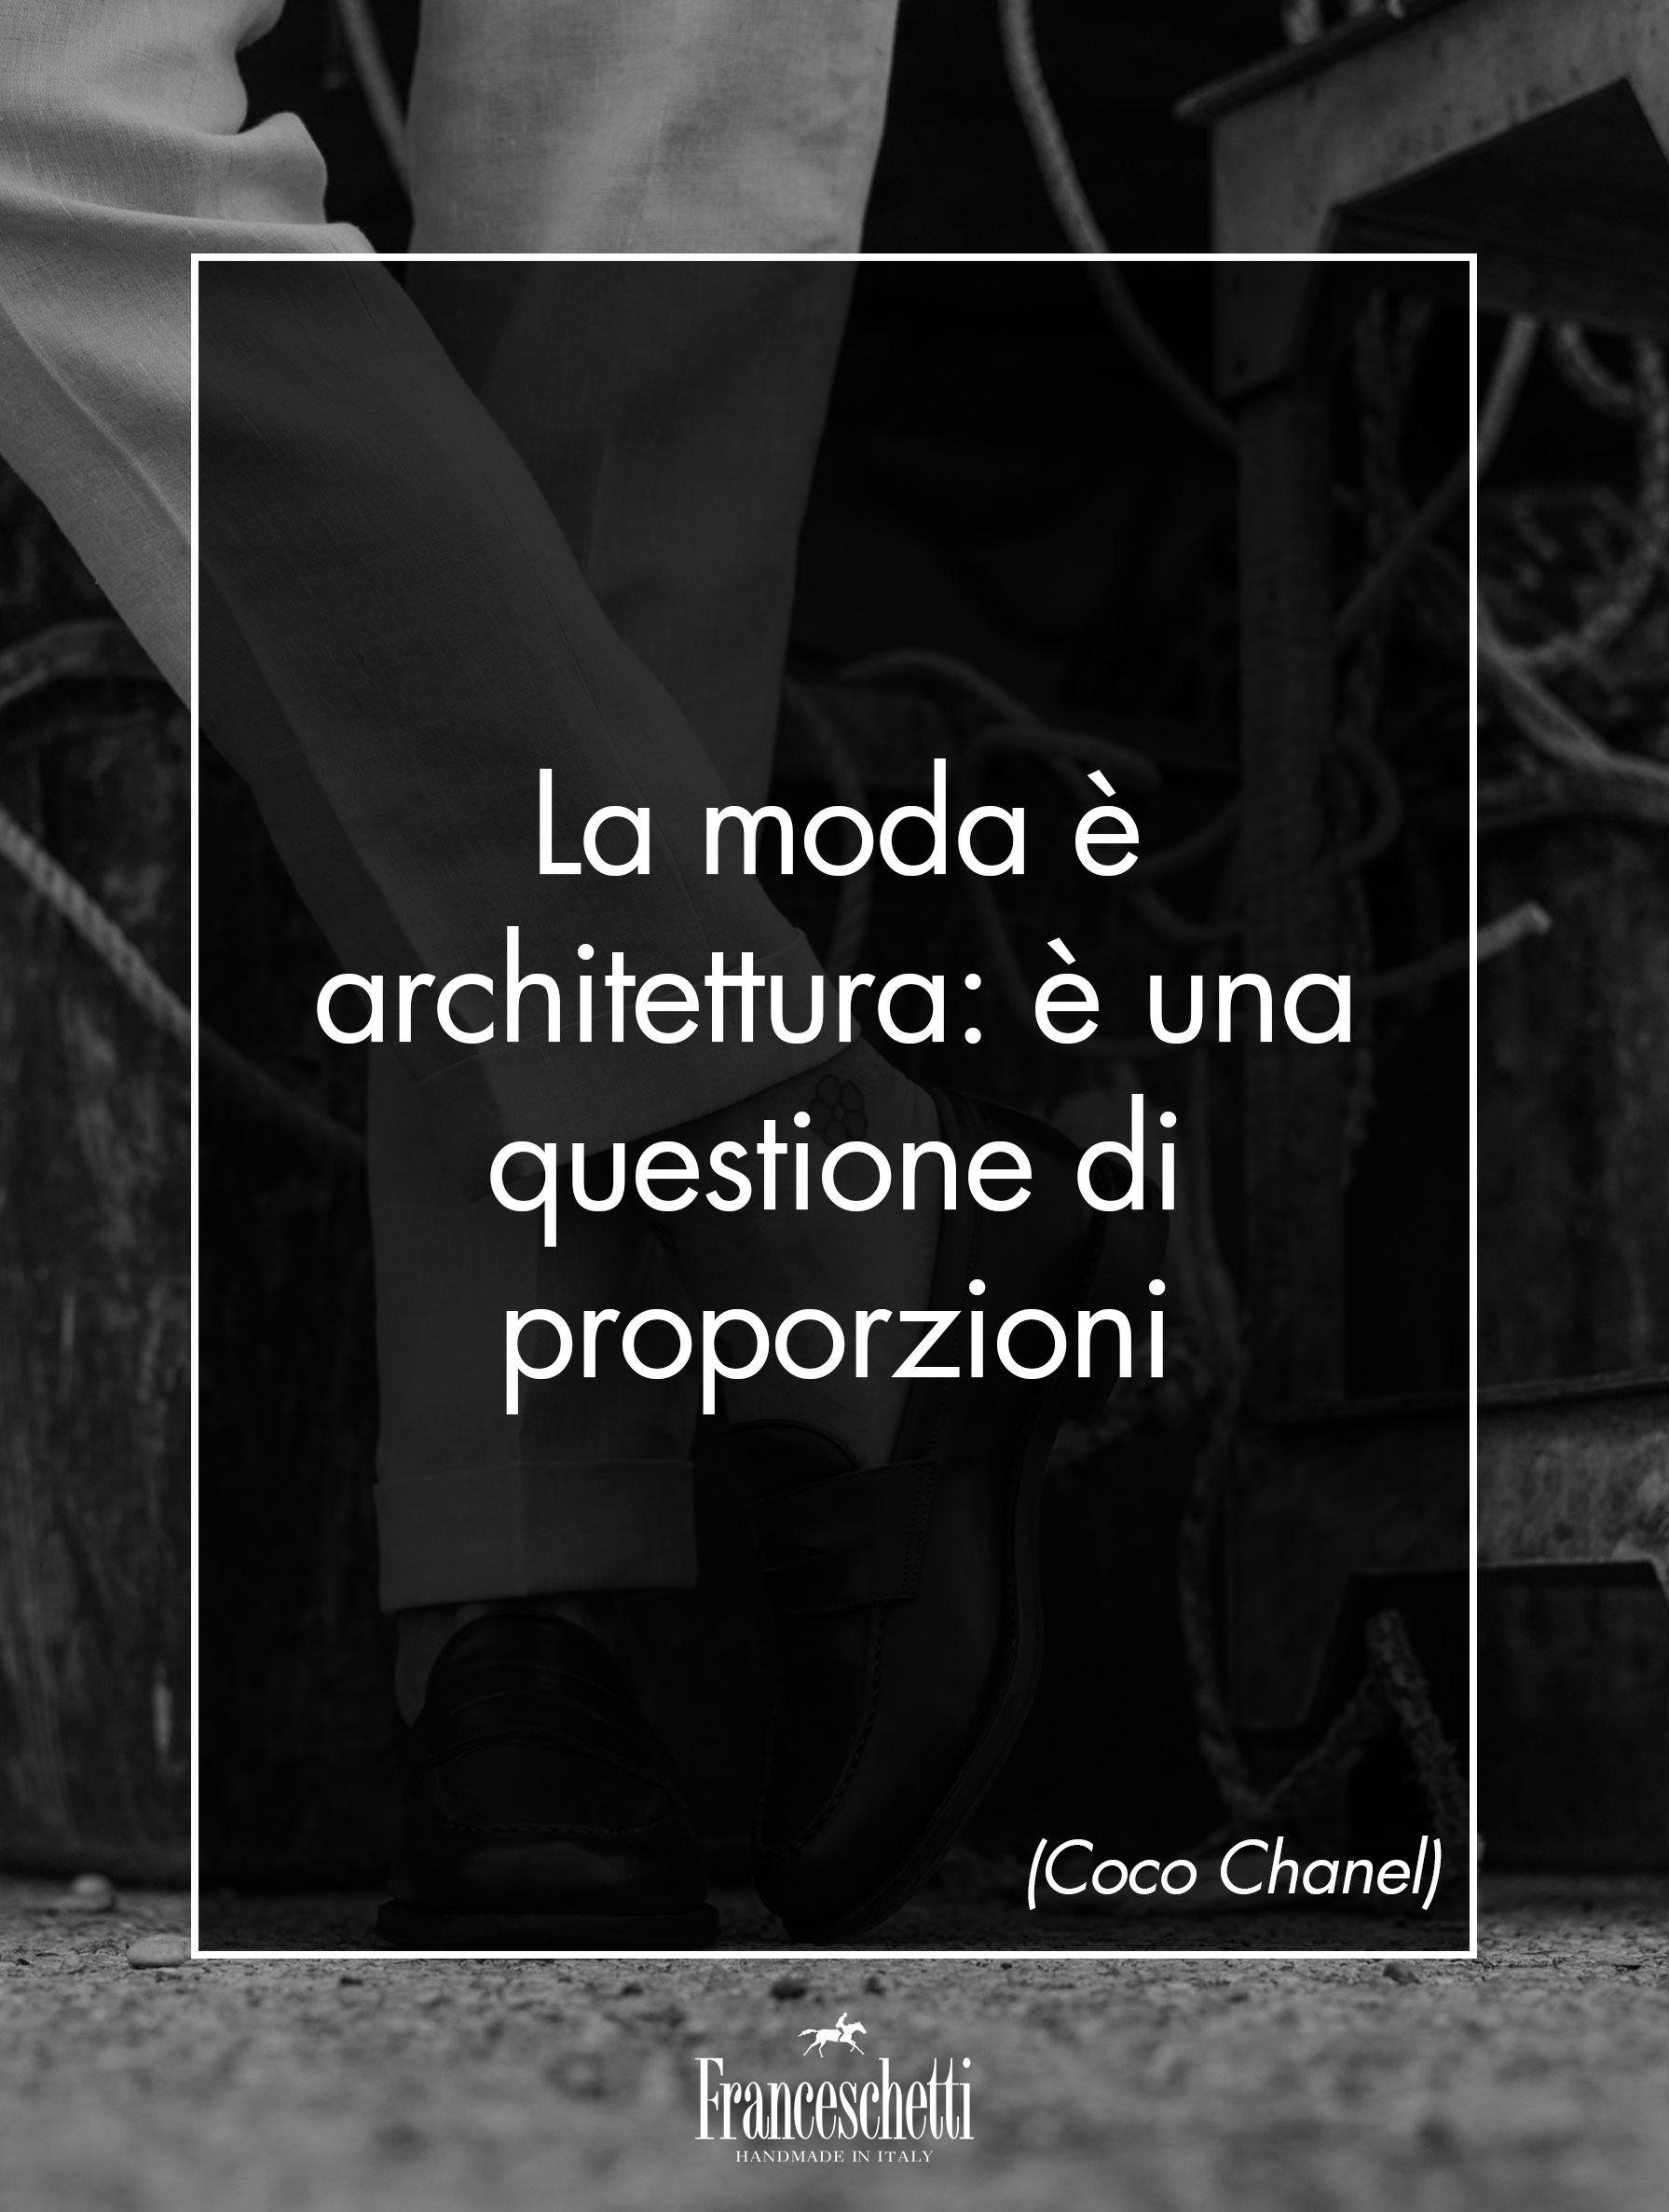 Frasi famose nella moda n.76 #fashion #aforismi #FranceschettiShoes #style # moda   Citazioni sulla moda, Citazioni, Citazioni d'ispirazione